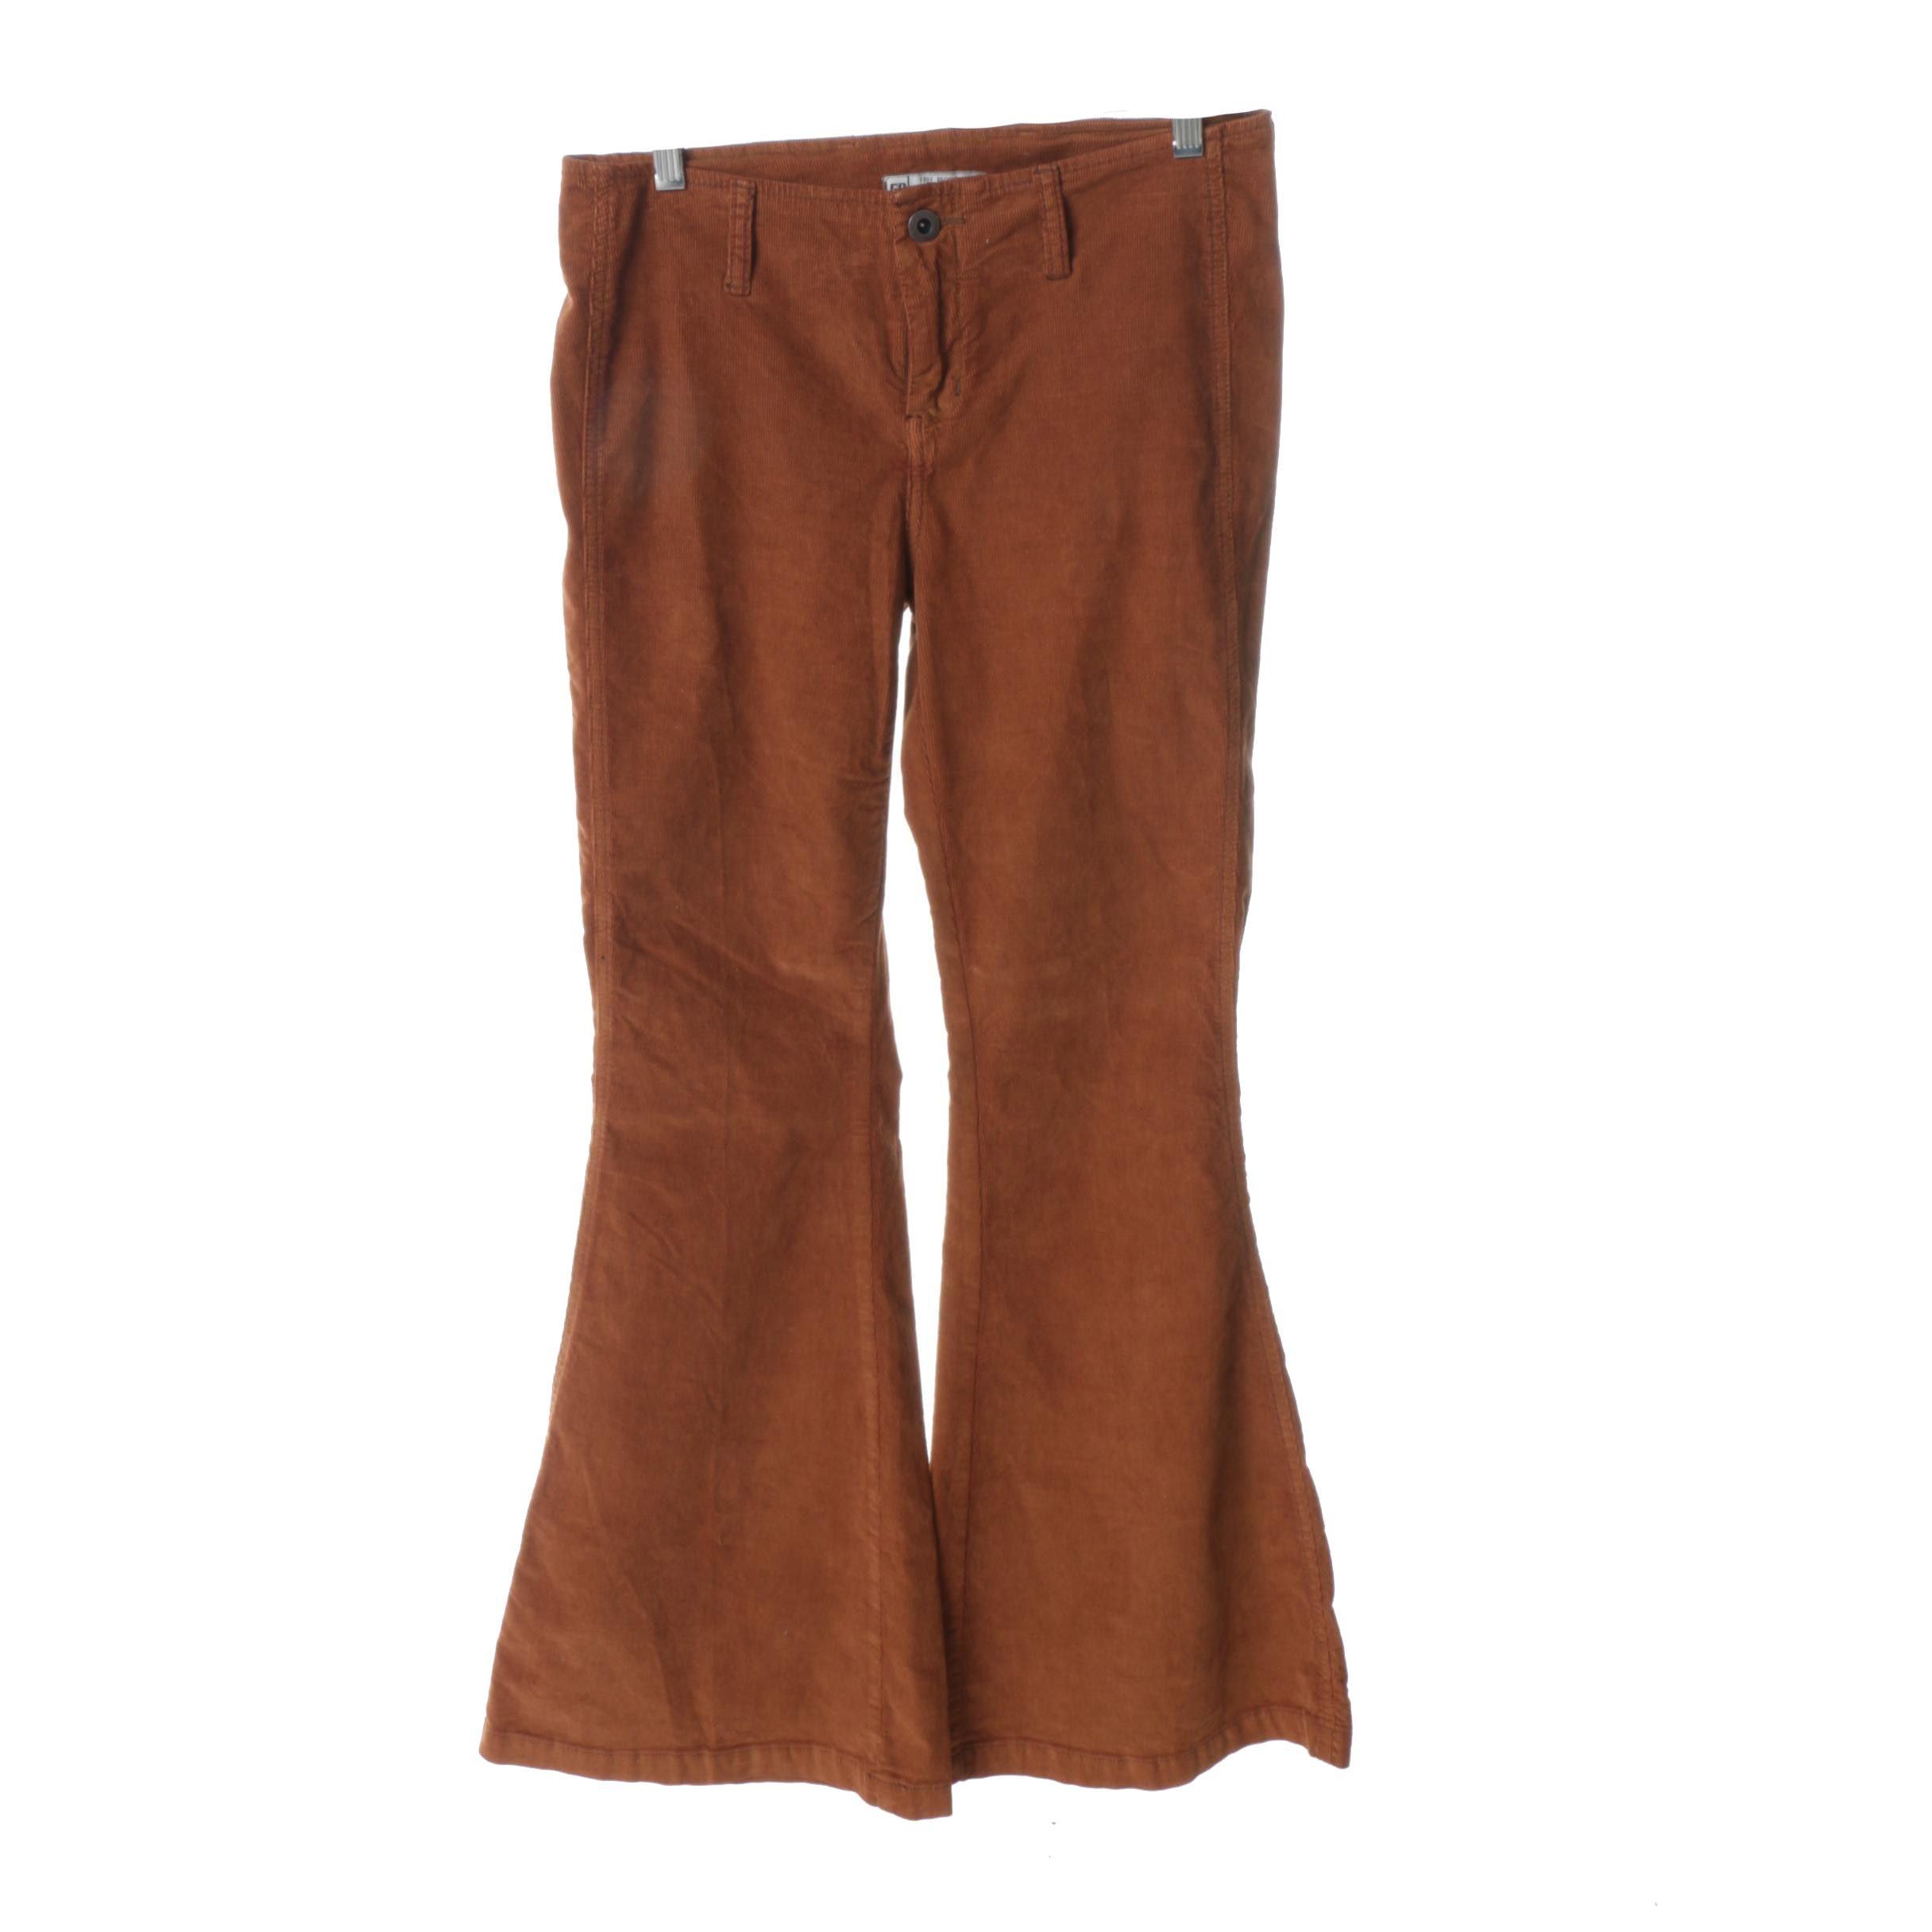 Free People Bell Bottom Corduroy Pants